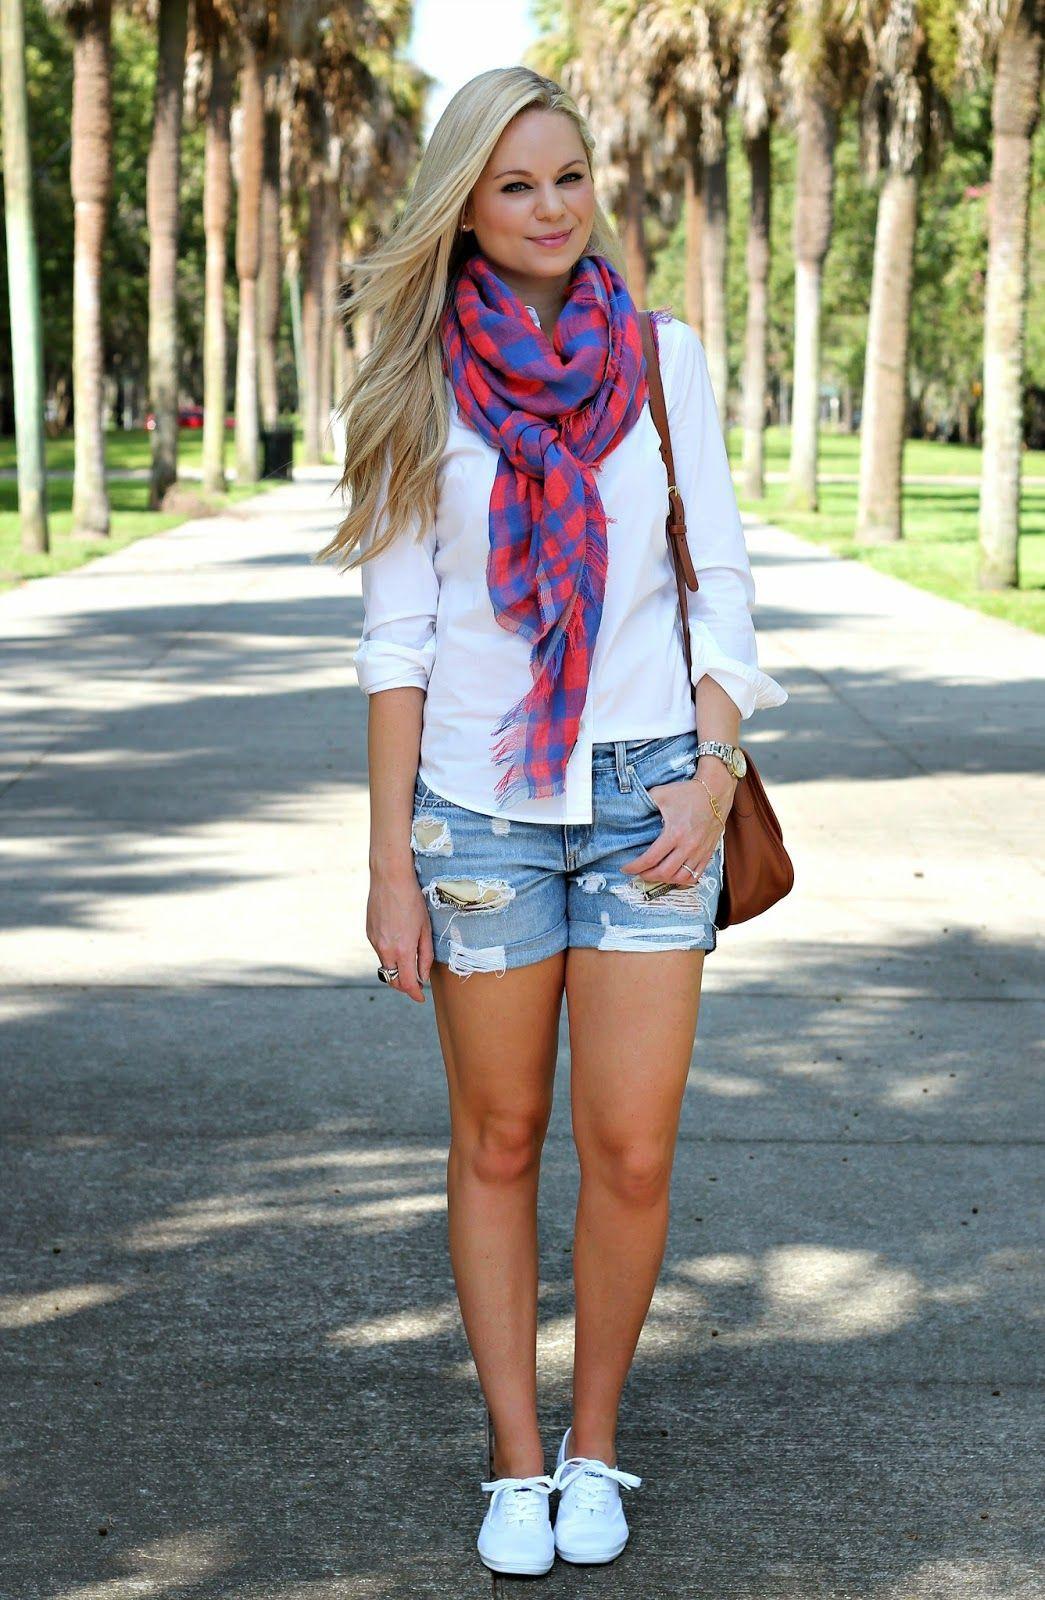 instinto compacto Impuro  Lookbook dress bows and depos, street fashion, jean short | Converse Outfits  | Casual Outfits, Jean Short, Pink Outfit